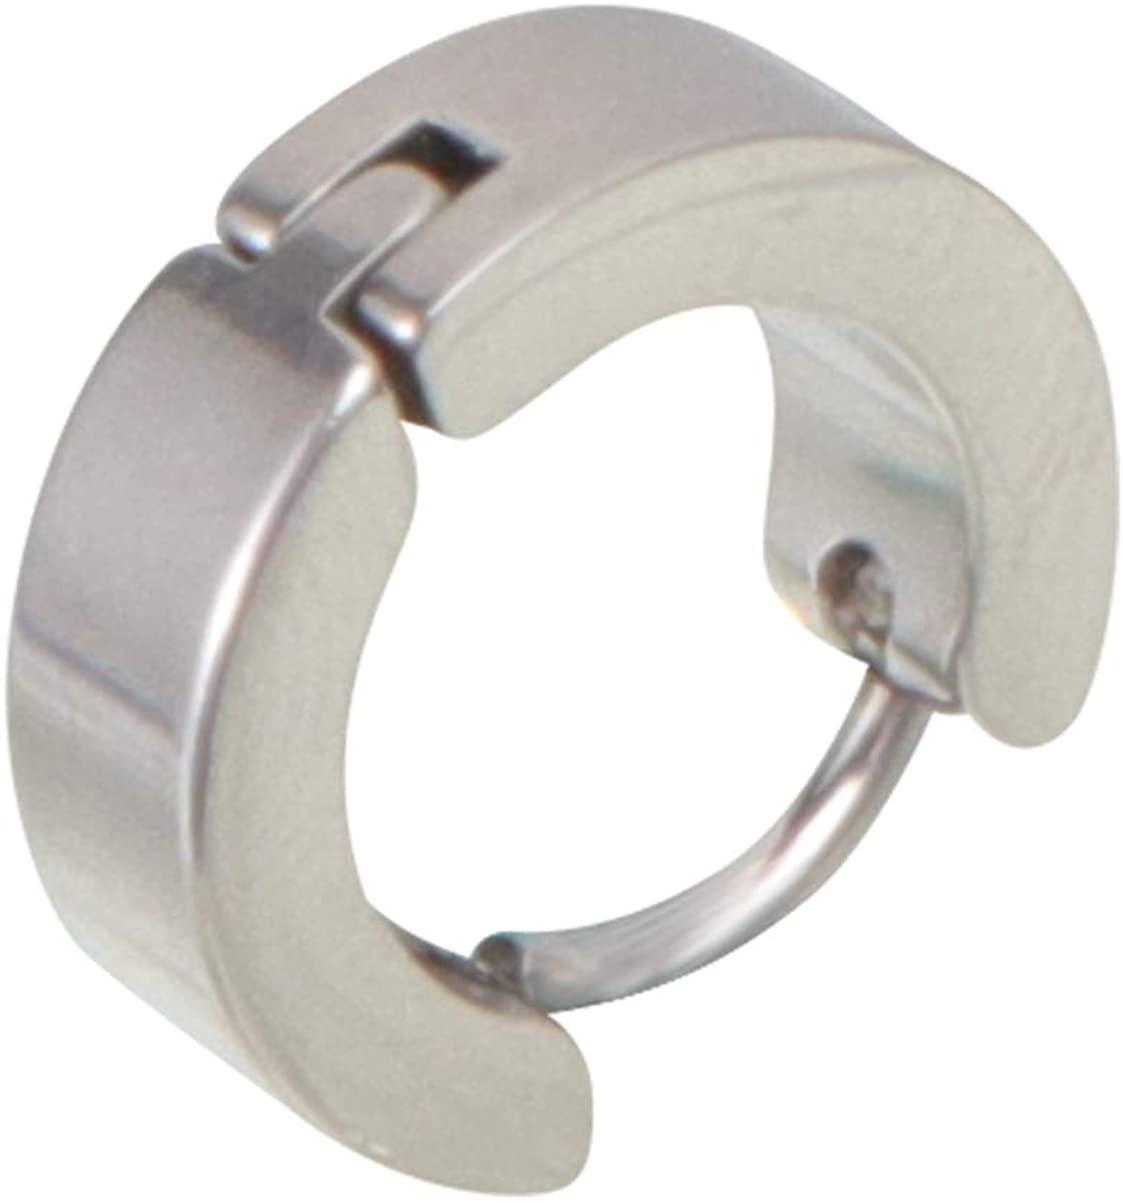 Happyyami Huggie Hoop Earrings Stainless Steel Punk Hinged Earrings Stud Earrings Ear Jewelry for Men Women (Black)